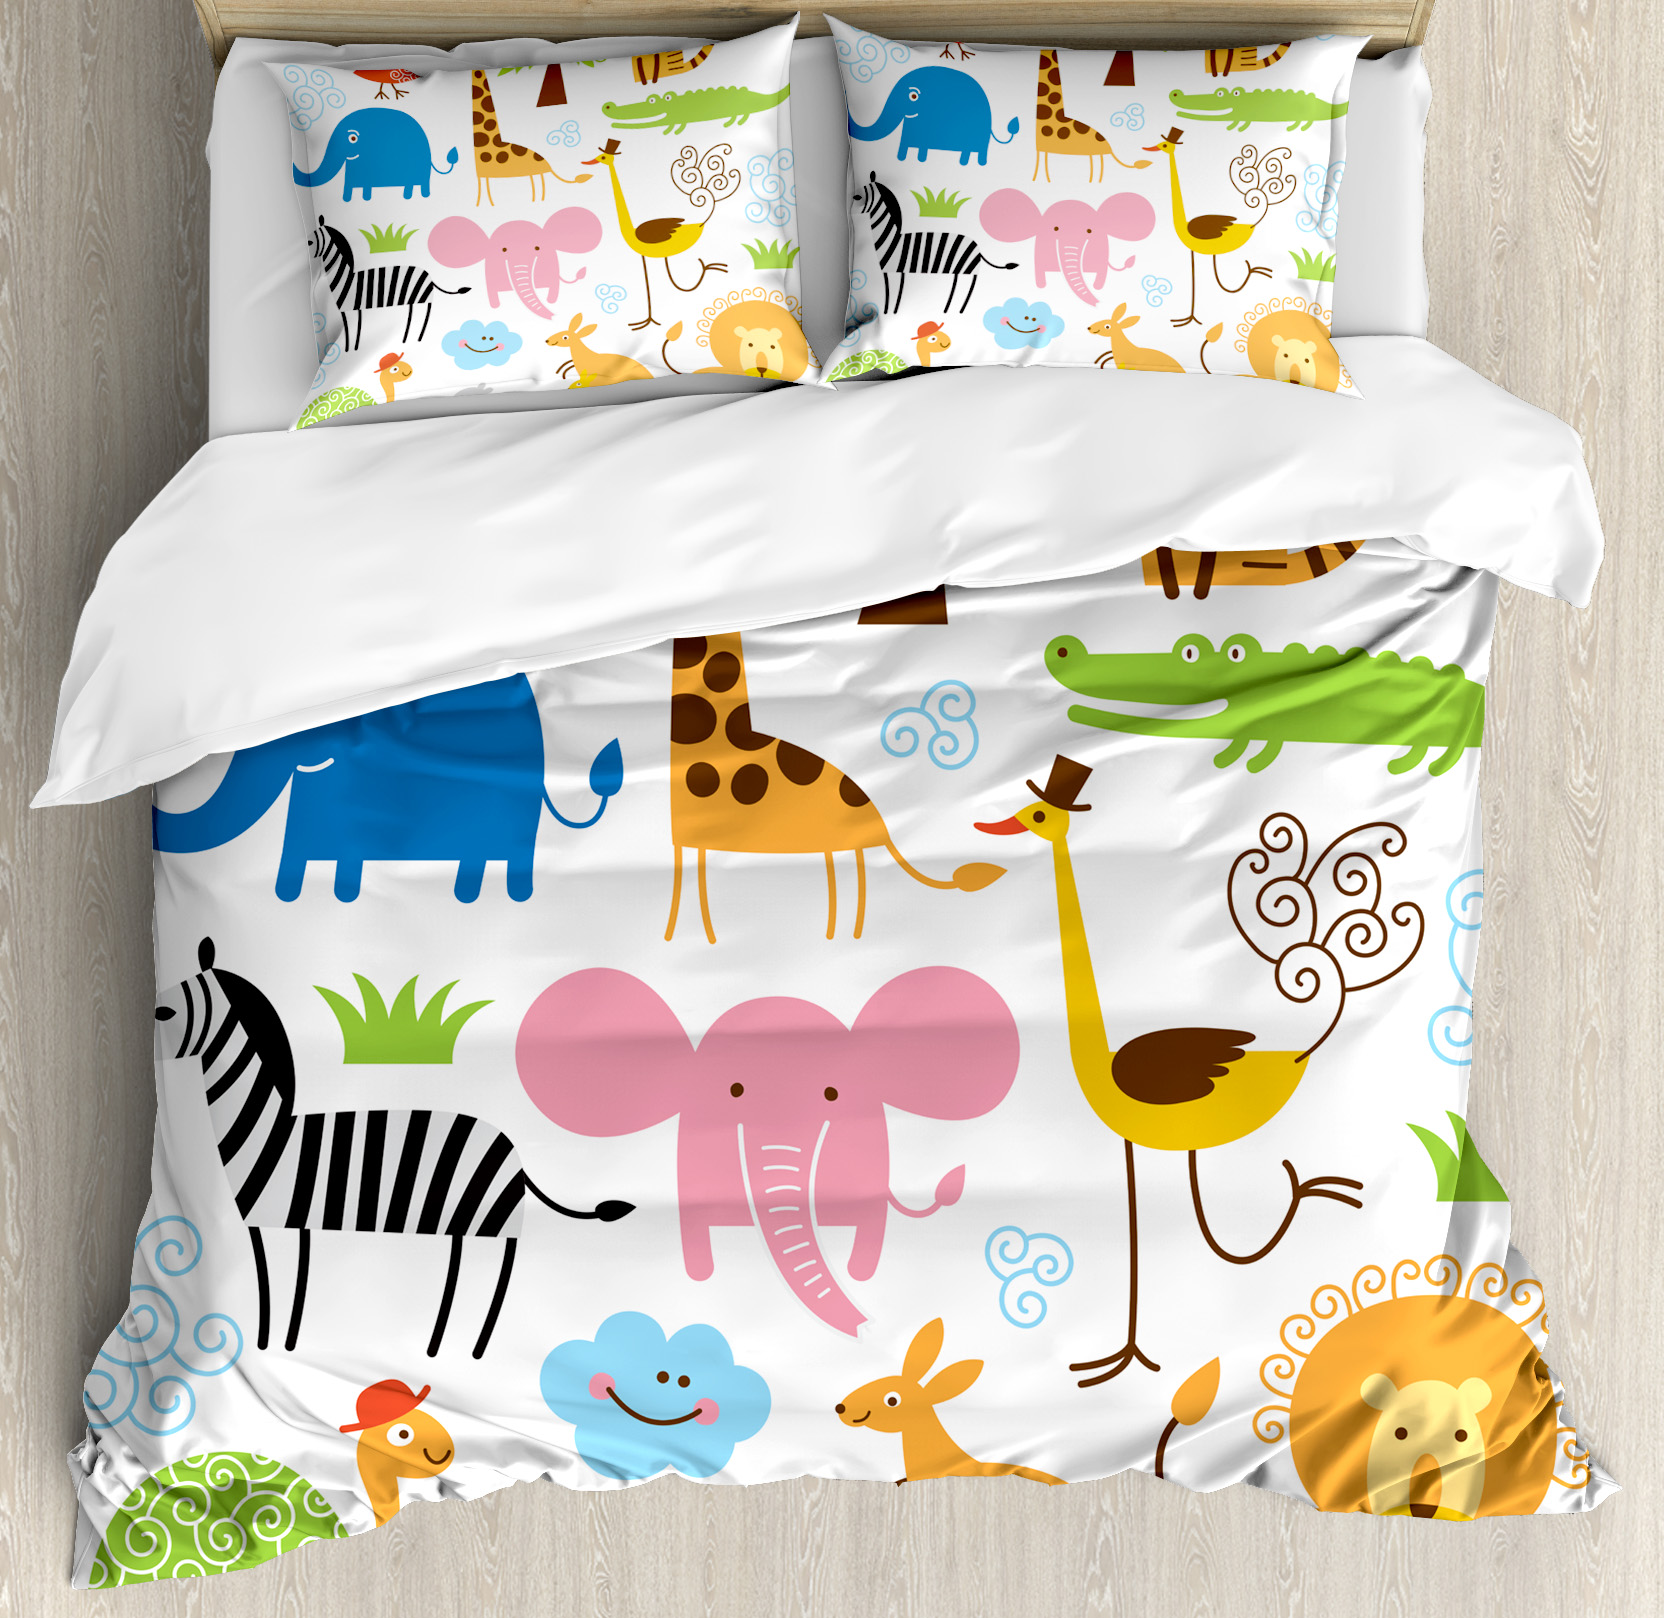 Click here to buy Animal King Size Duvet Cover Set, Cute Set of Giraffe Elephant Zebra Turtle Kids Nursery... by Kozmos.